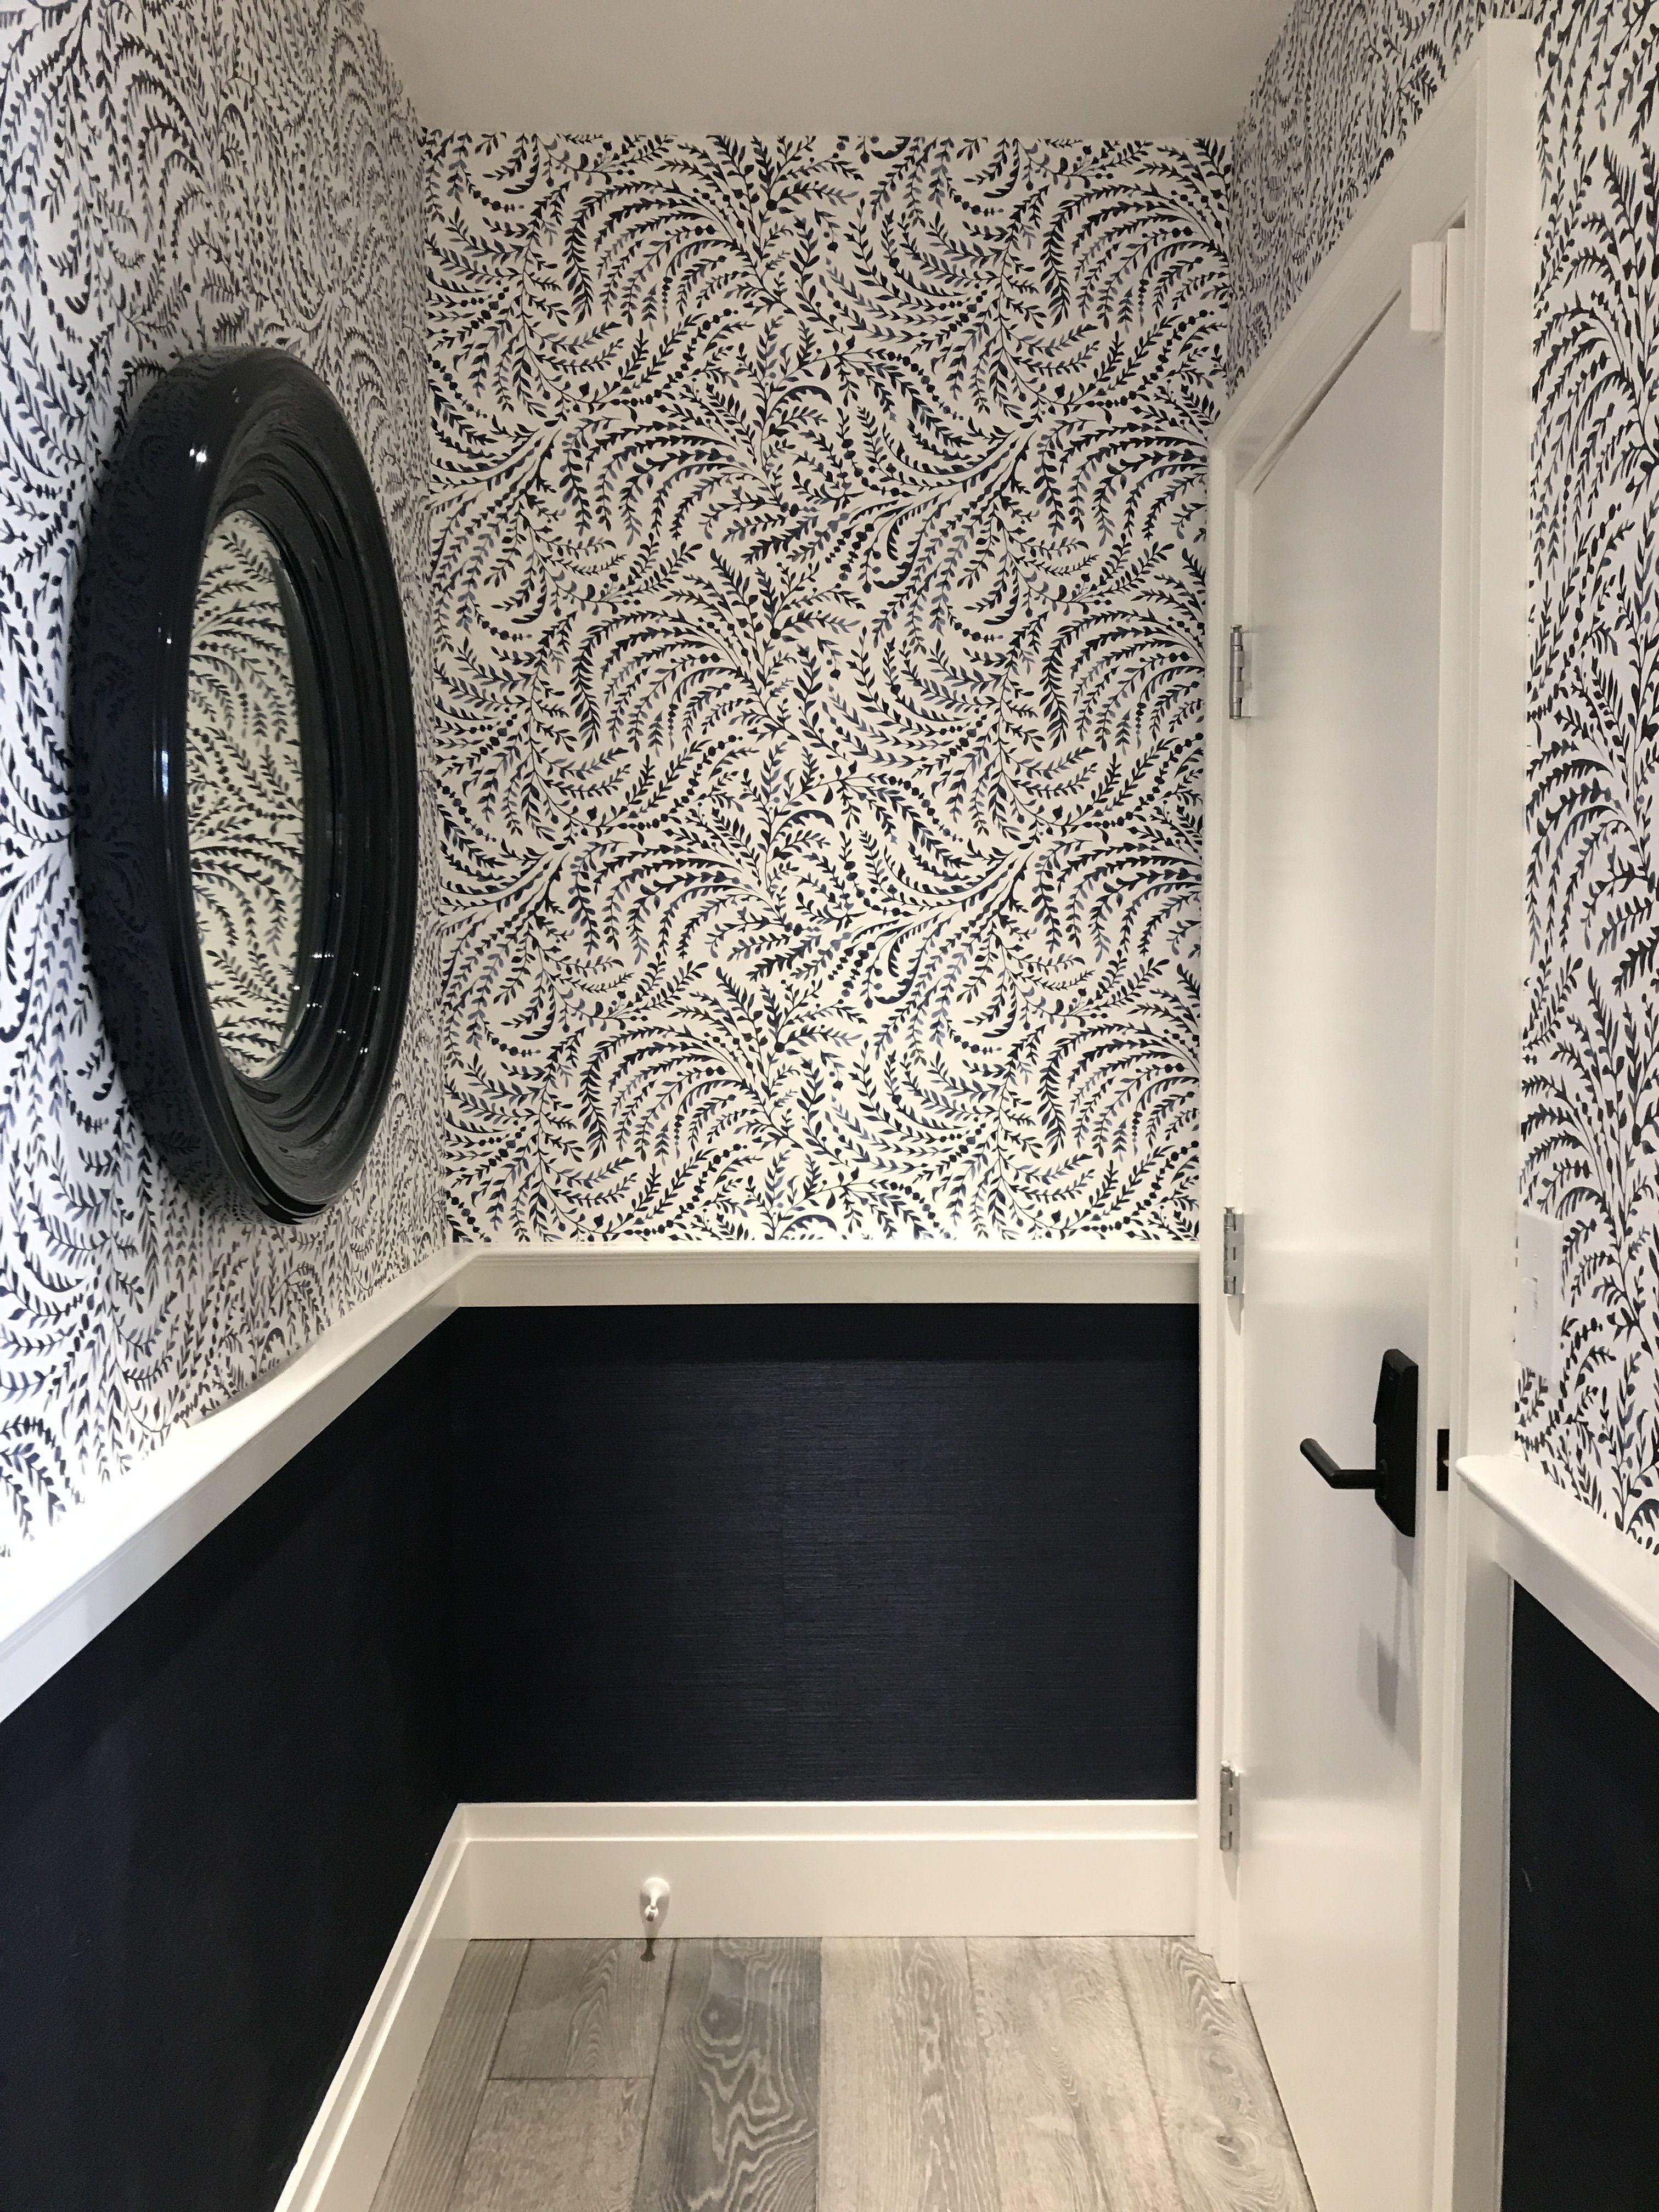 Serena Lily Store Powder Room Wallpaper In 2019 Serena